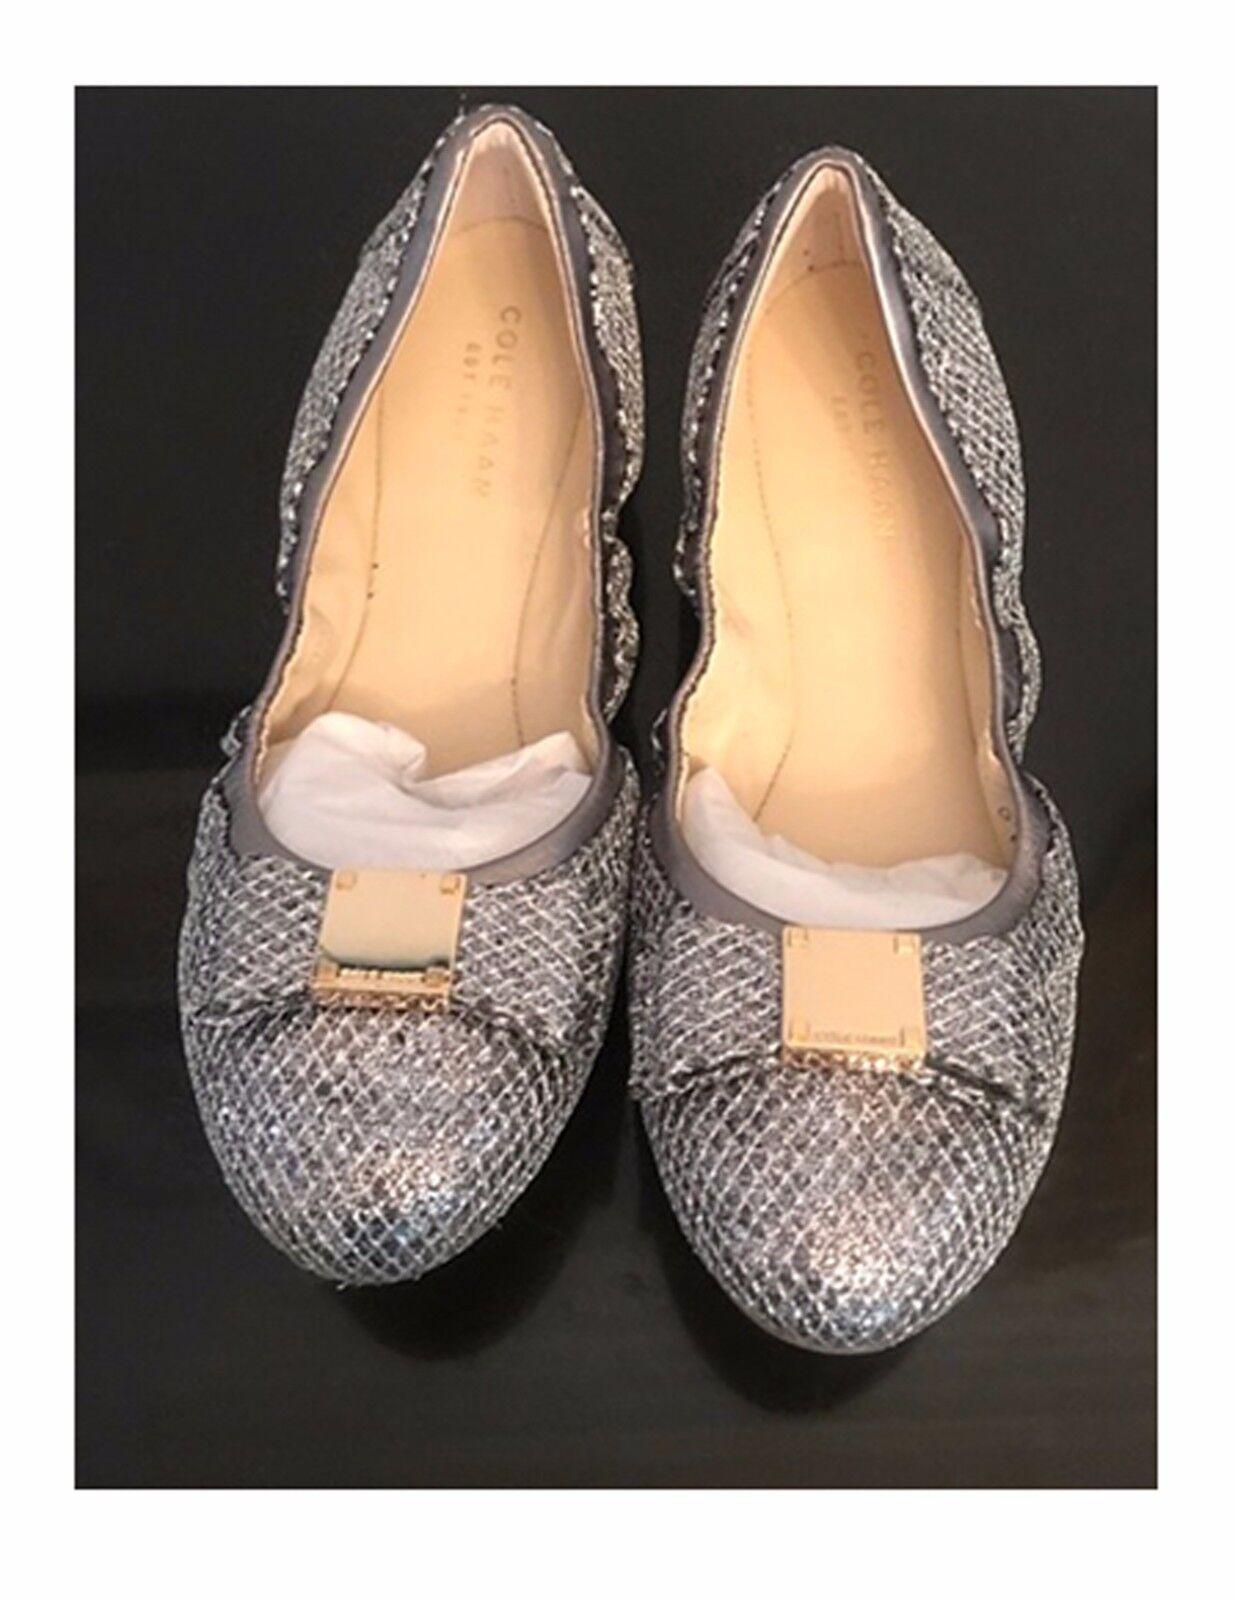 NEW    180 Cole Haan Tali Metallic Glitter Bow Ballet Flats 6 2faed4